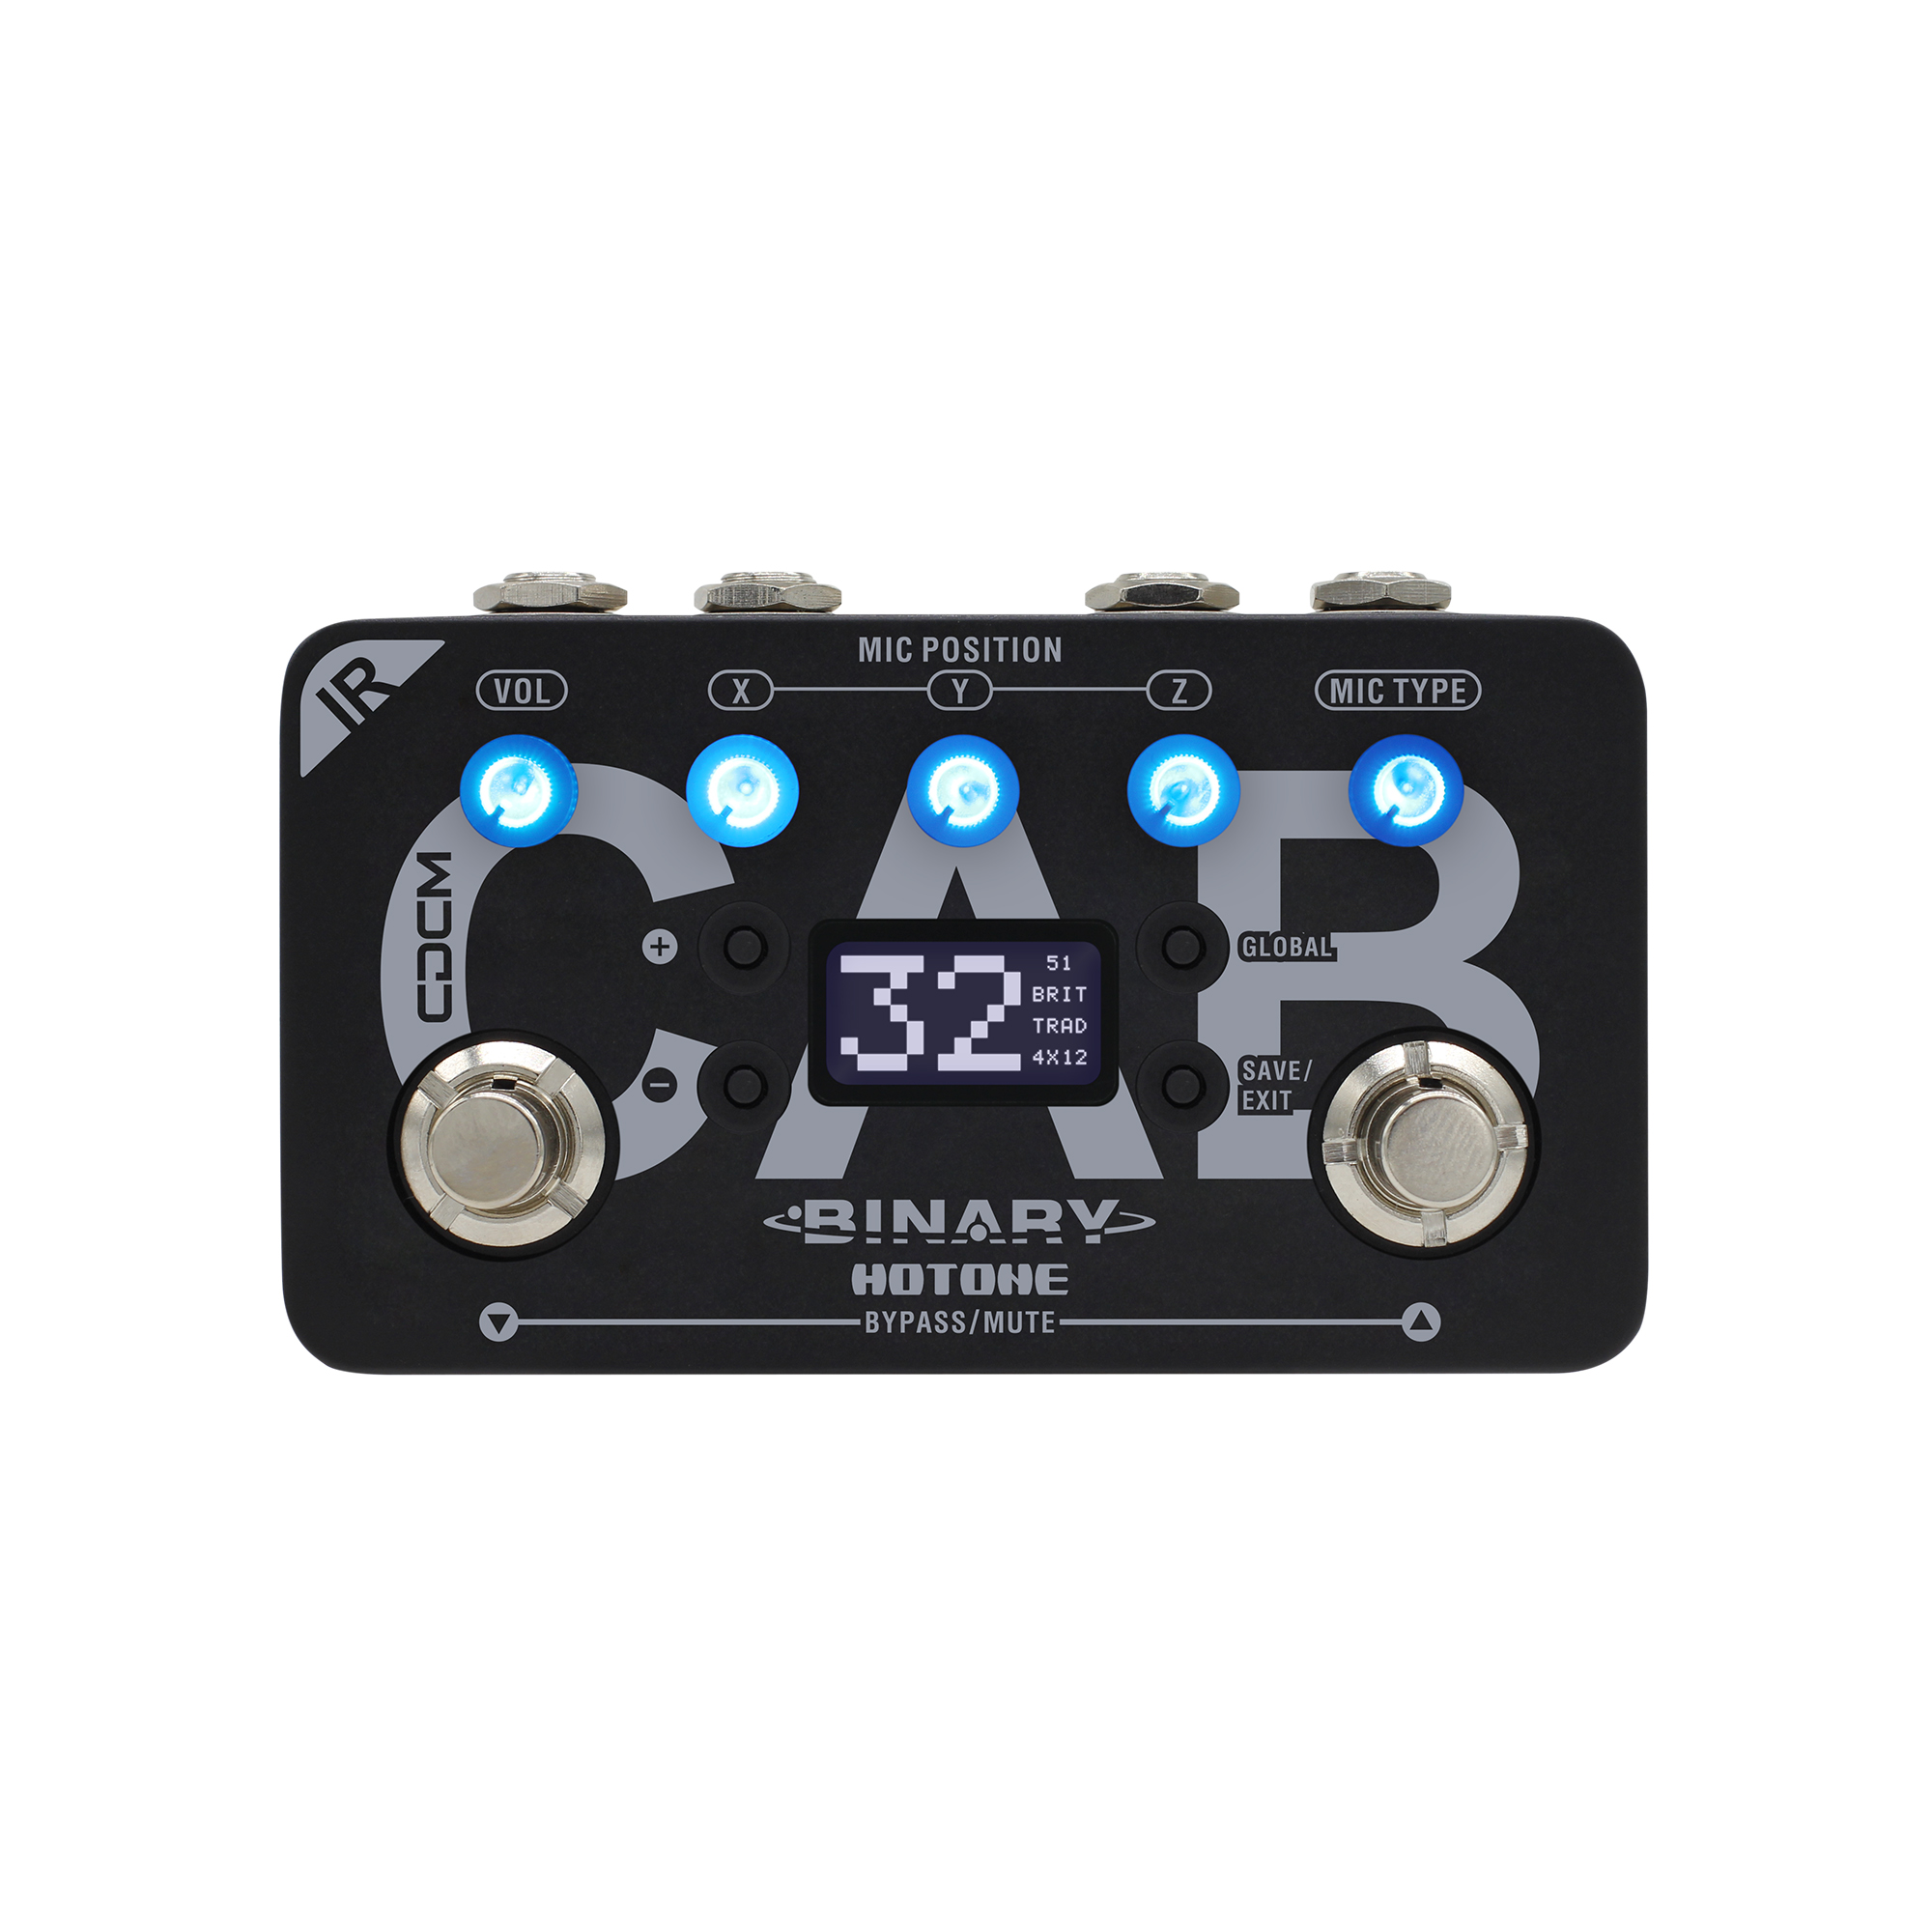 Hotone Omni IR Impulse Response Cabinet Simulator Guitar Pedal TPOMP6